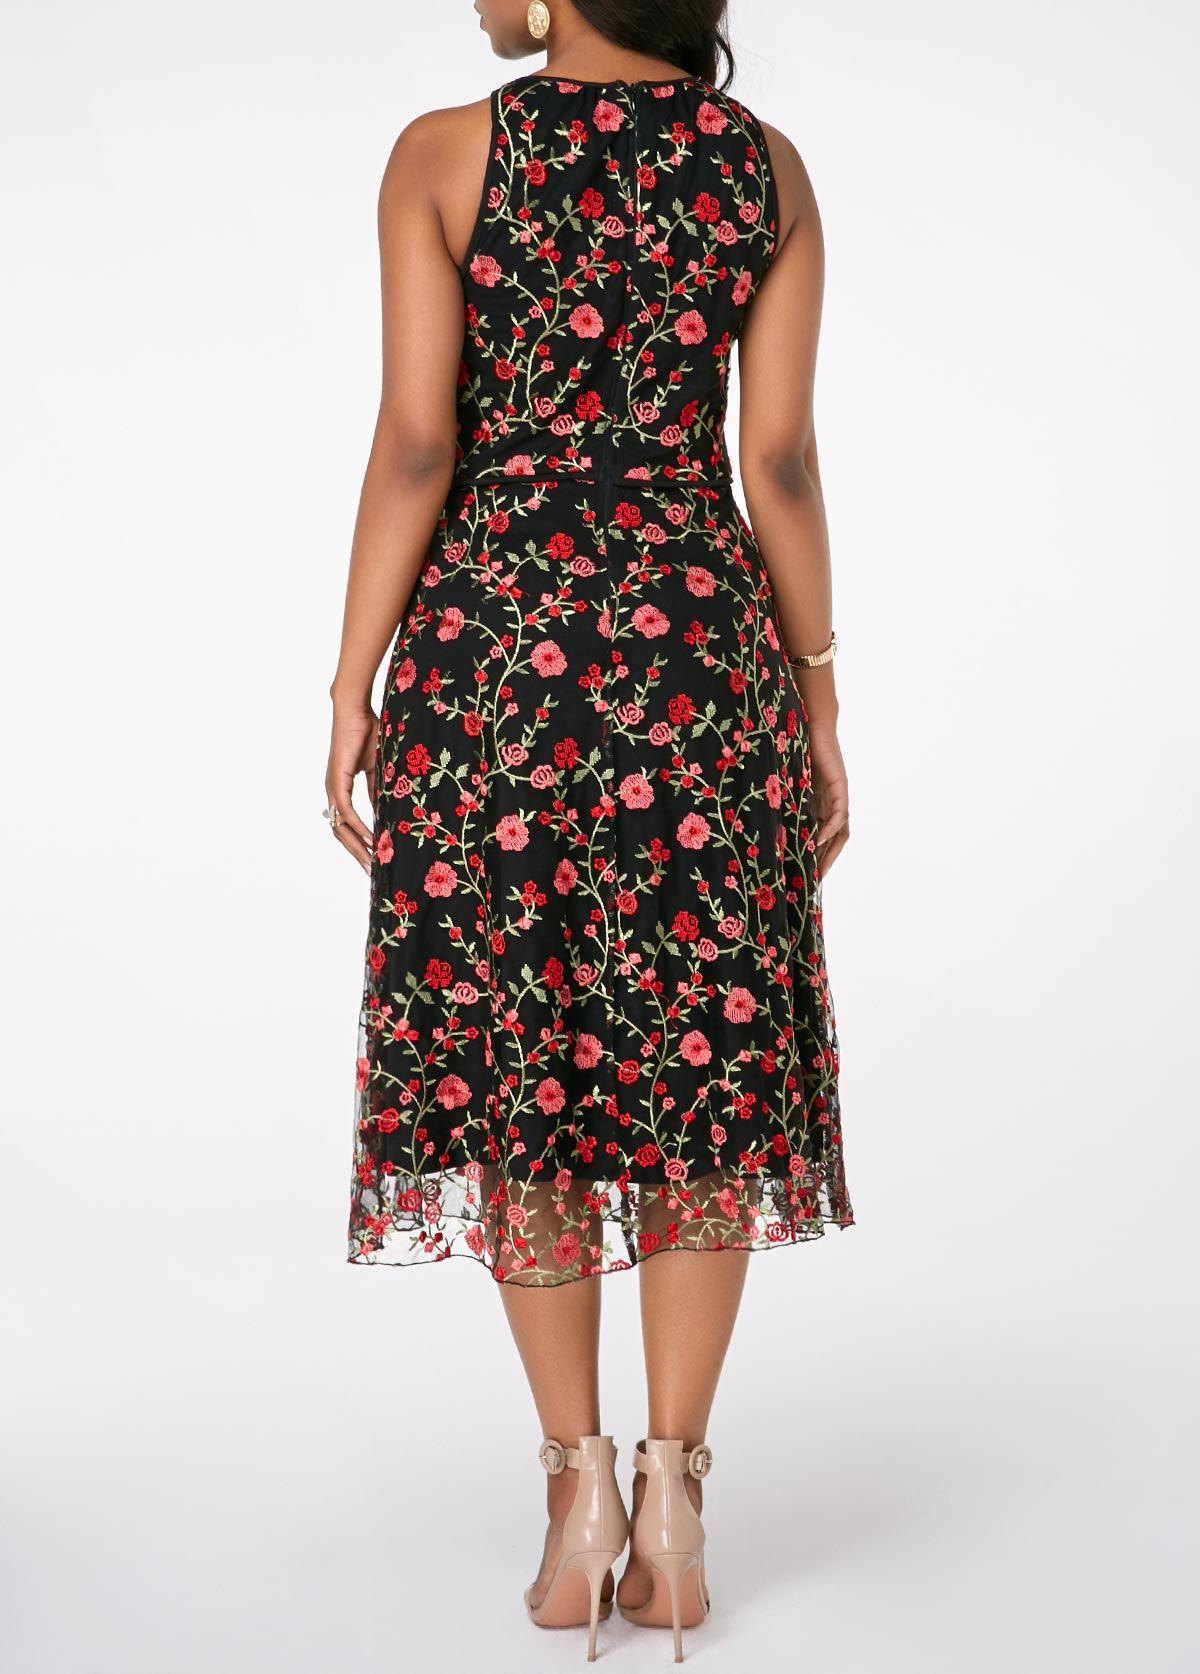 Mesh Patchwork Embroidered High Waist Dress Rosewe Com Usd 39 30 [ 1674 x 1200 Pixel ]